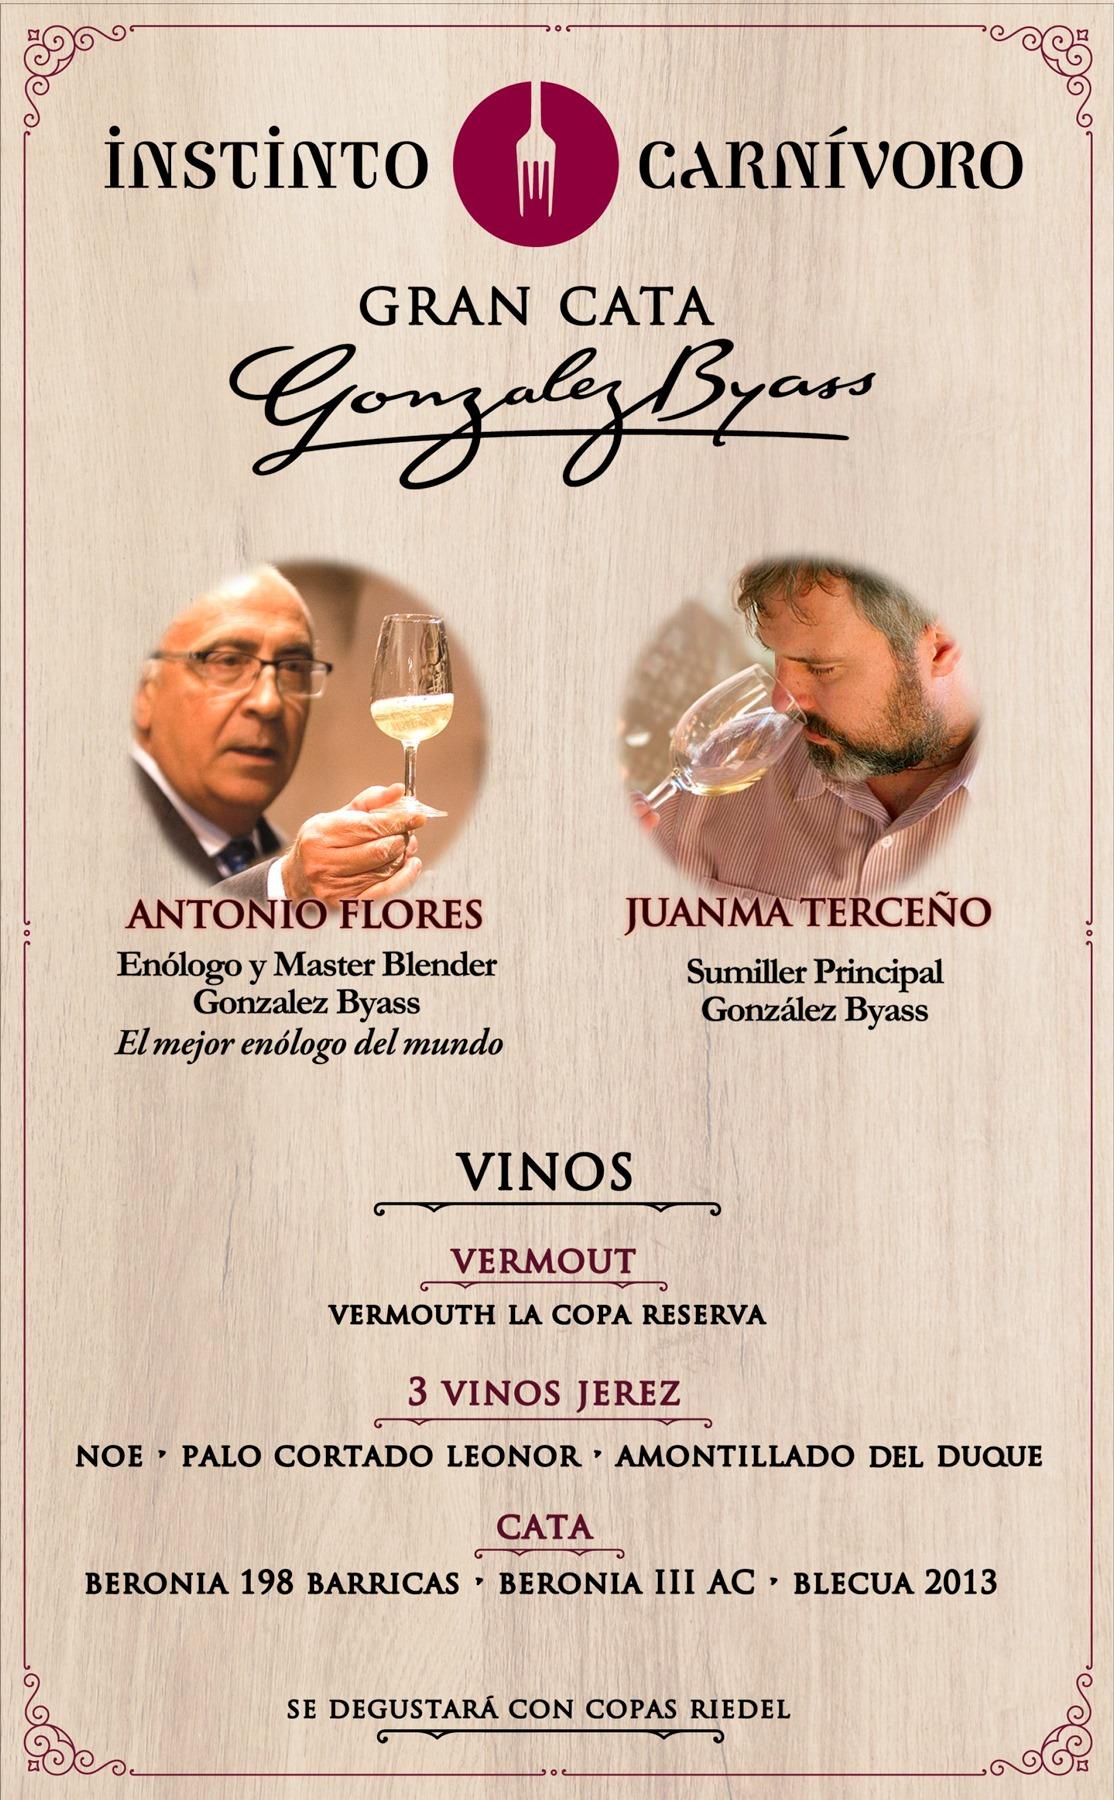 Cata de Vinos Bodegas González Byass en el restaurante Instinto Carnívoro